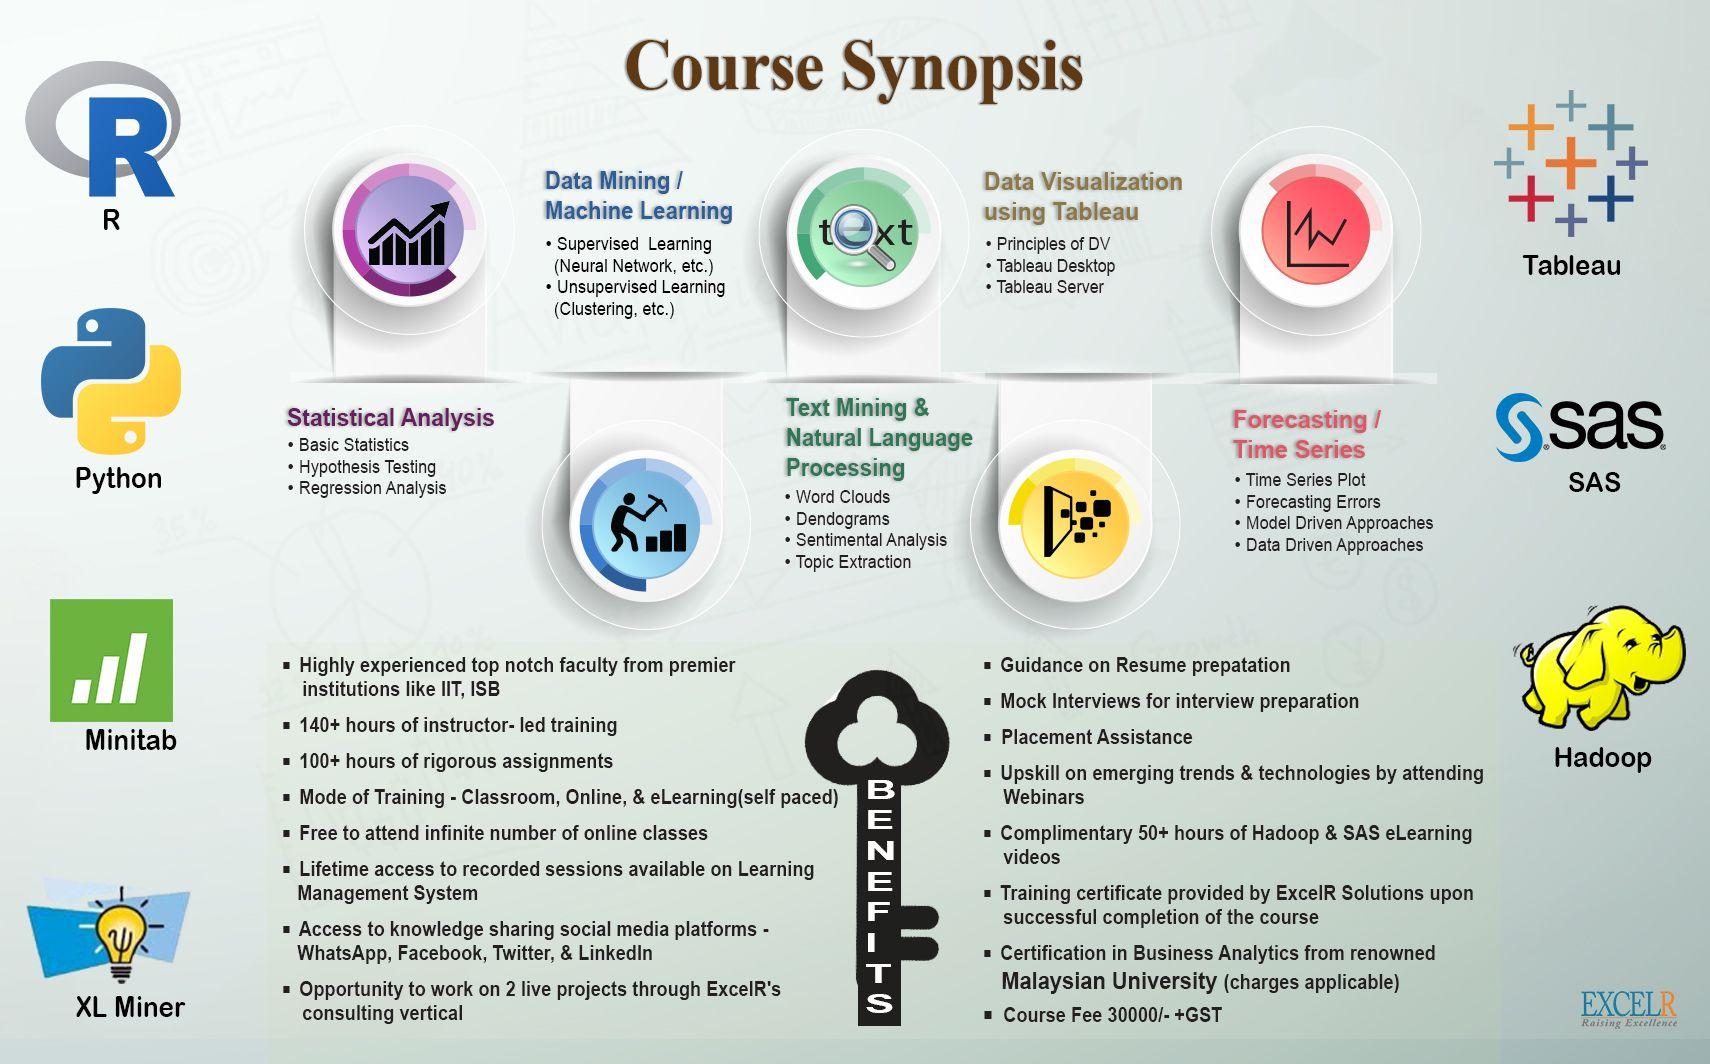 Best Free Online Data Analytics Courses - Carles Pen